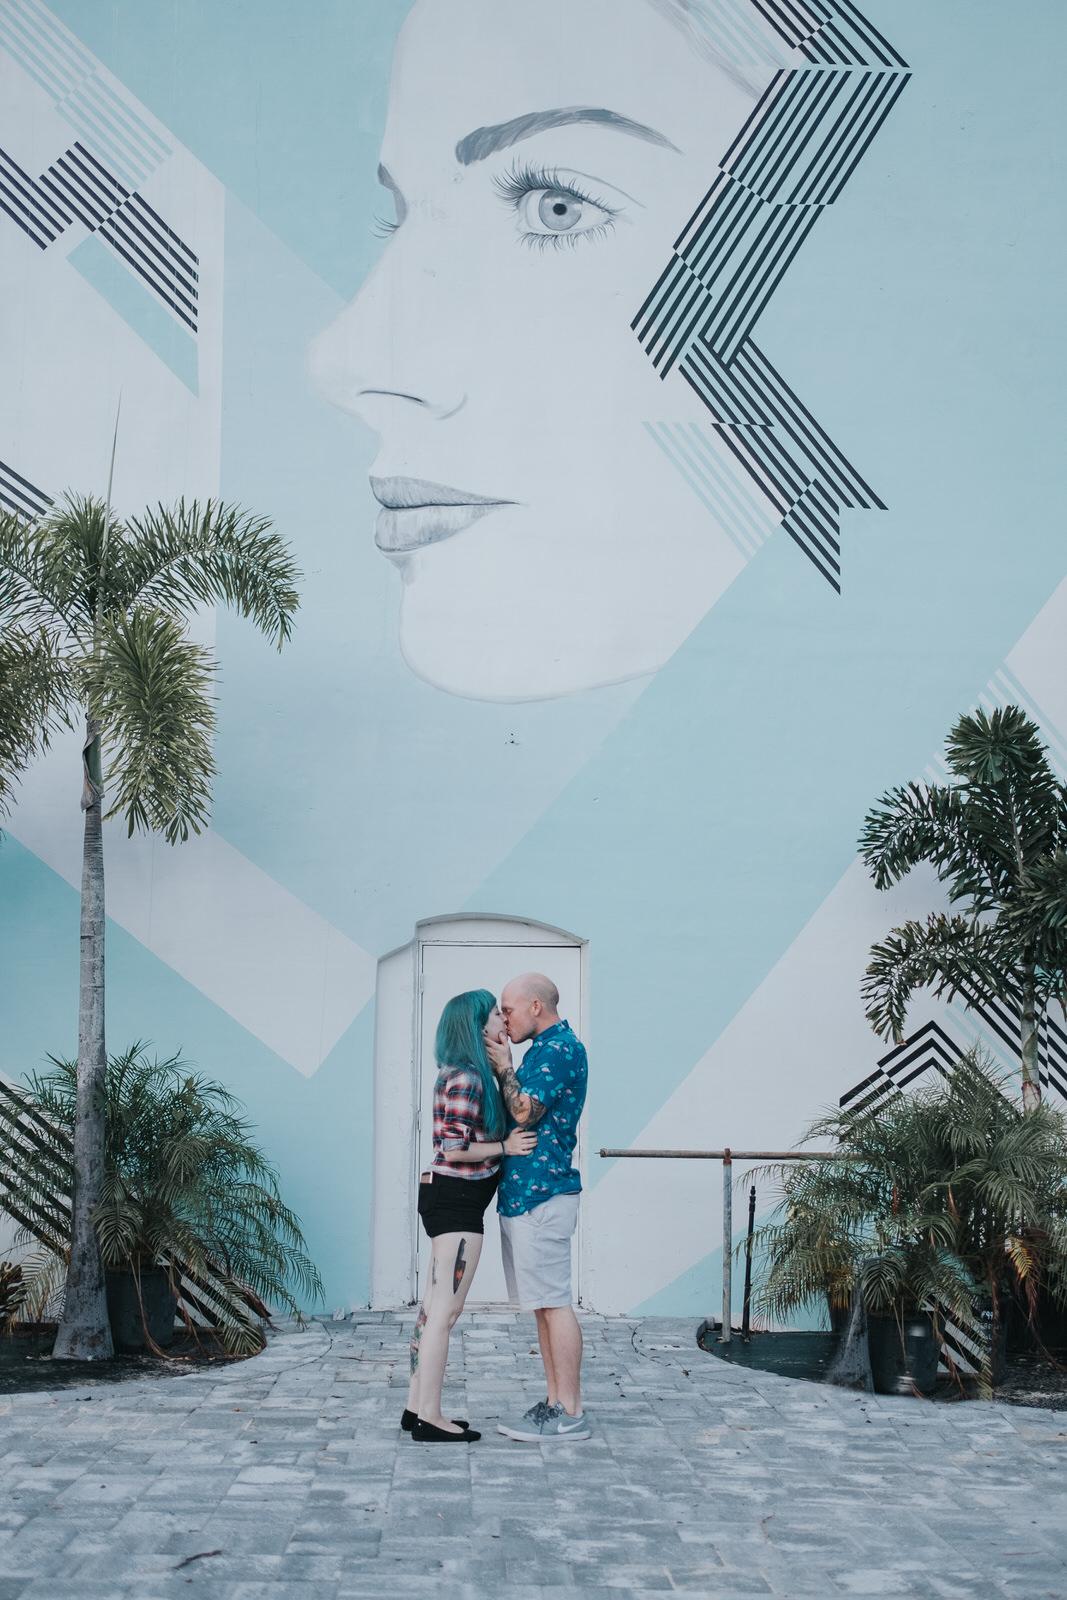 sbvisionwedding-eaugallie-arts-district-engagement-urban-2019-23.jpg